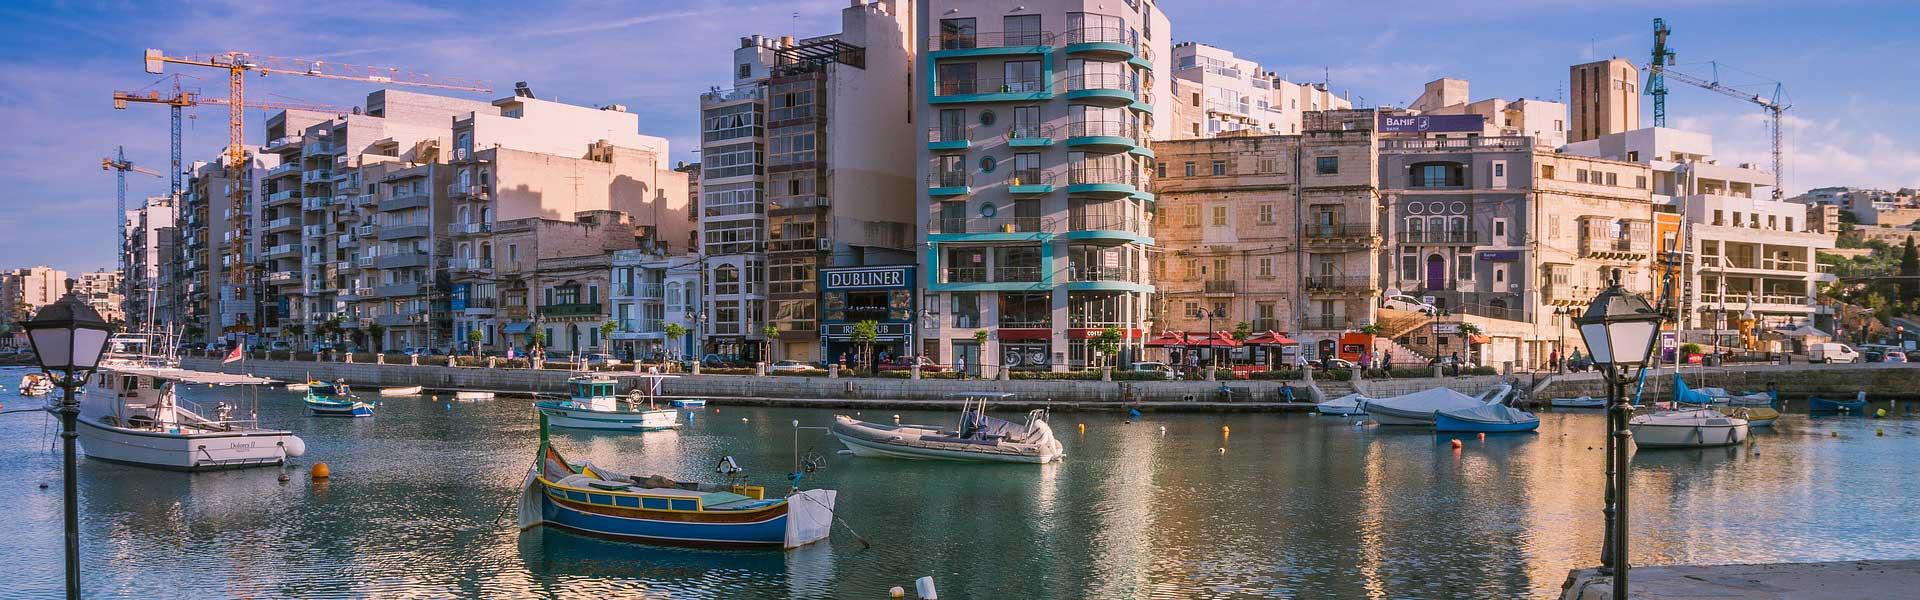 Best restaurants in St Julians, Malta - Restaurant guide